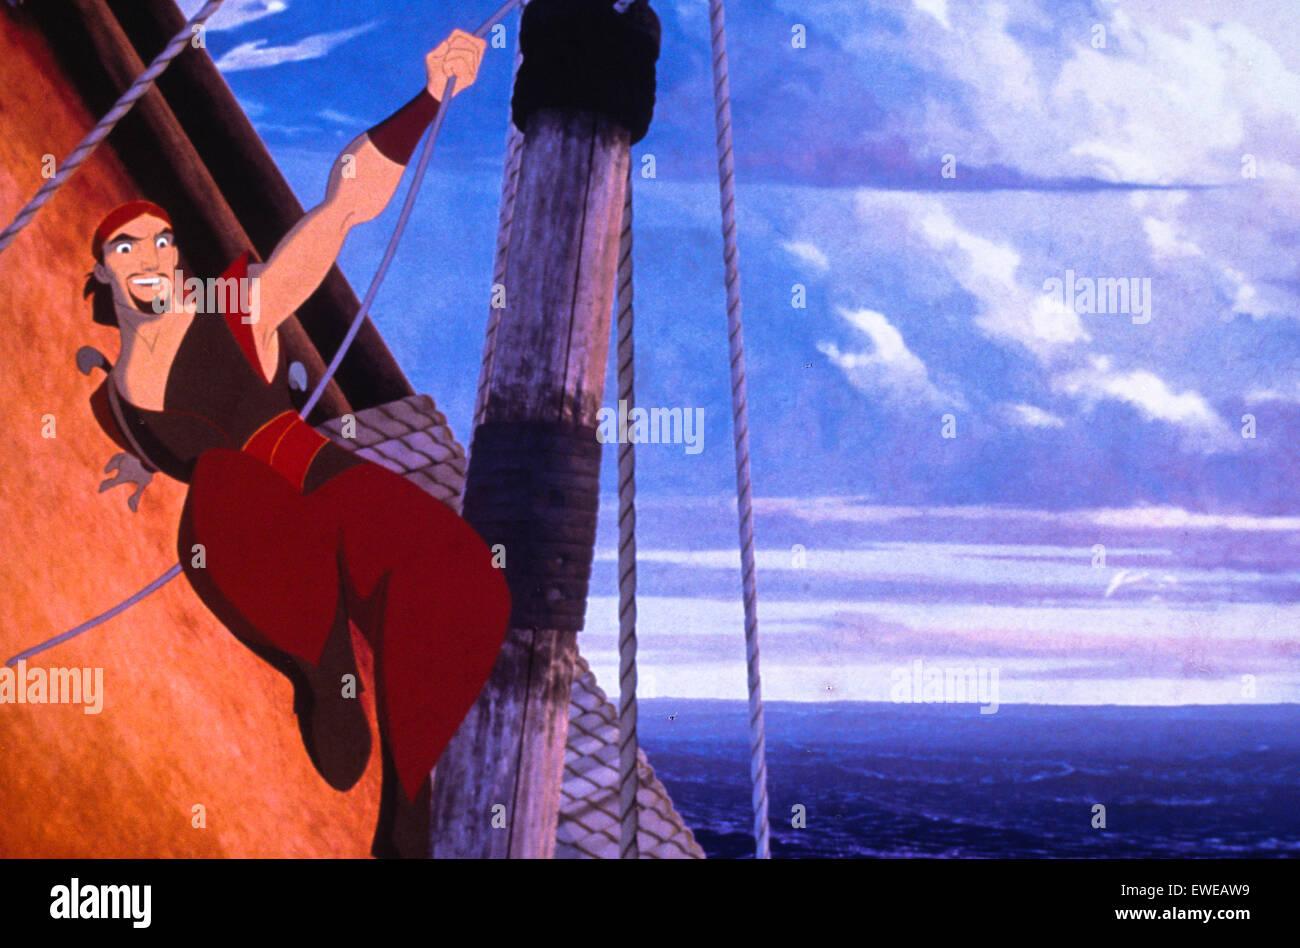 Sinbad la légende des sept mers Photo Stock